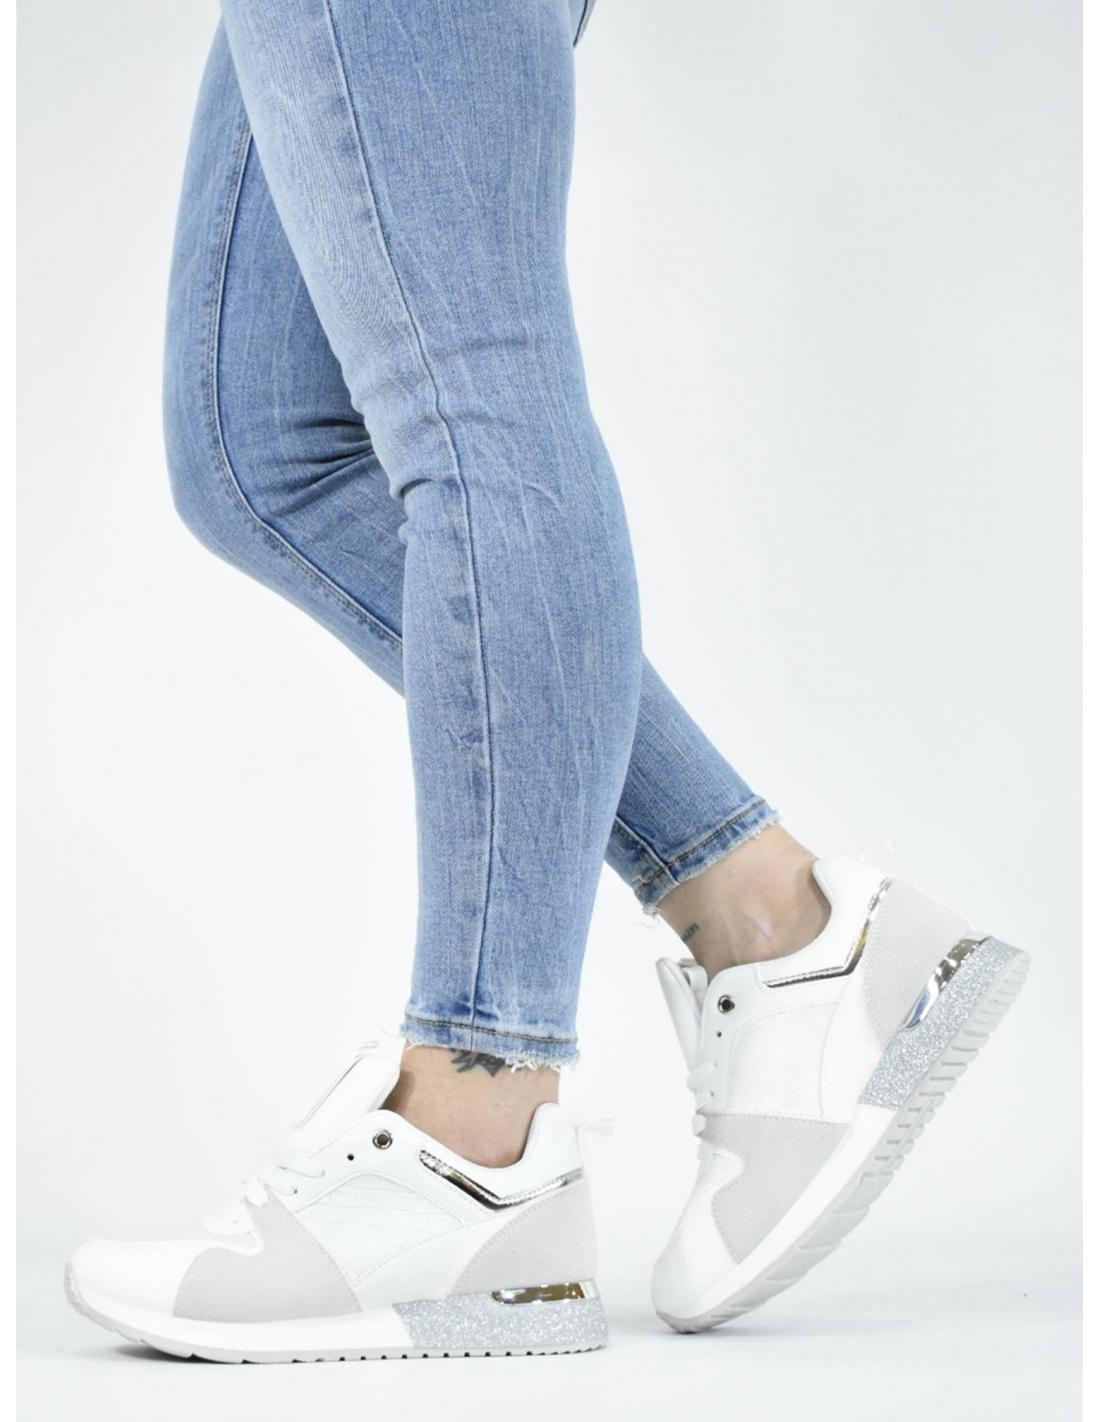 Deportivo de vestir blanco